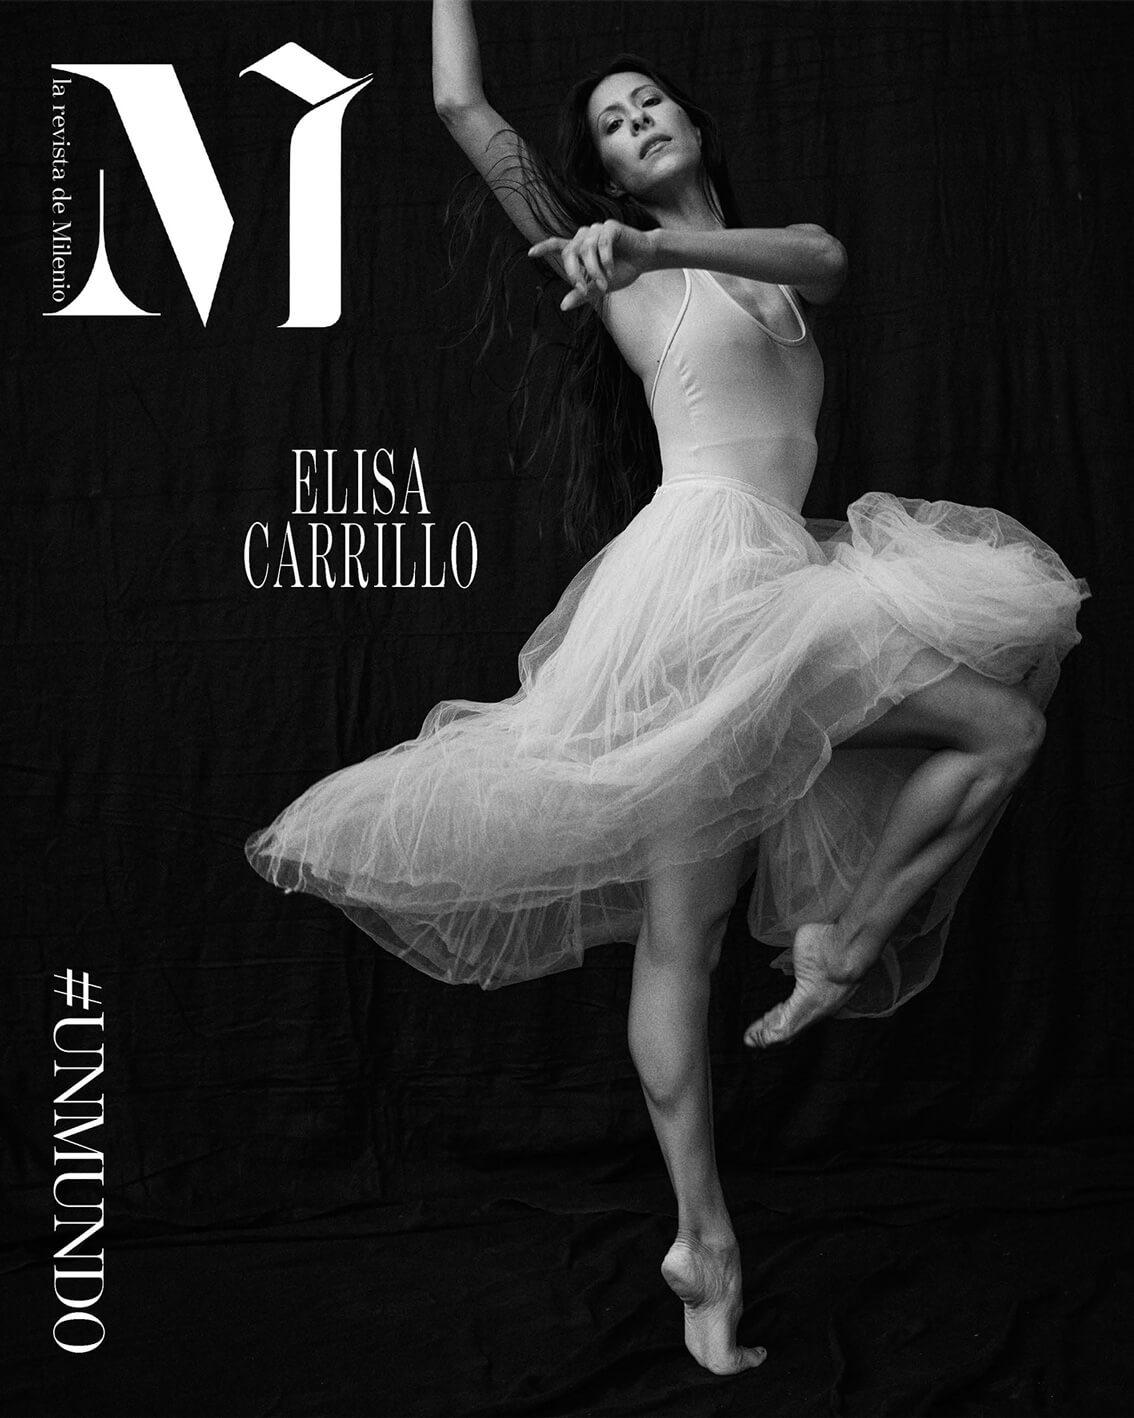 Milenio x Elisa Carrillo by Alex Waltl